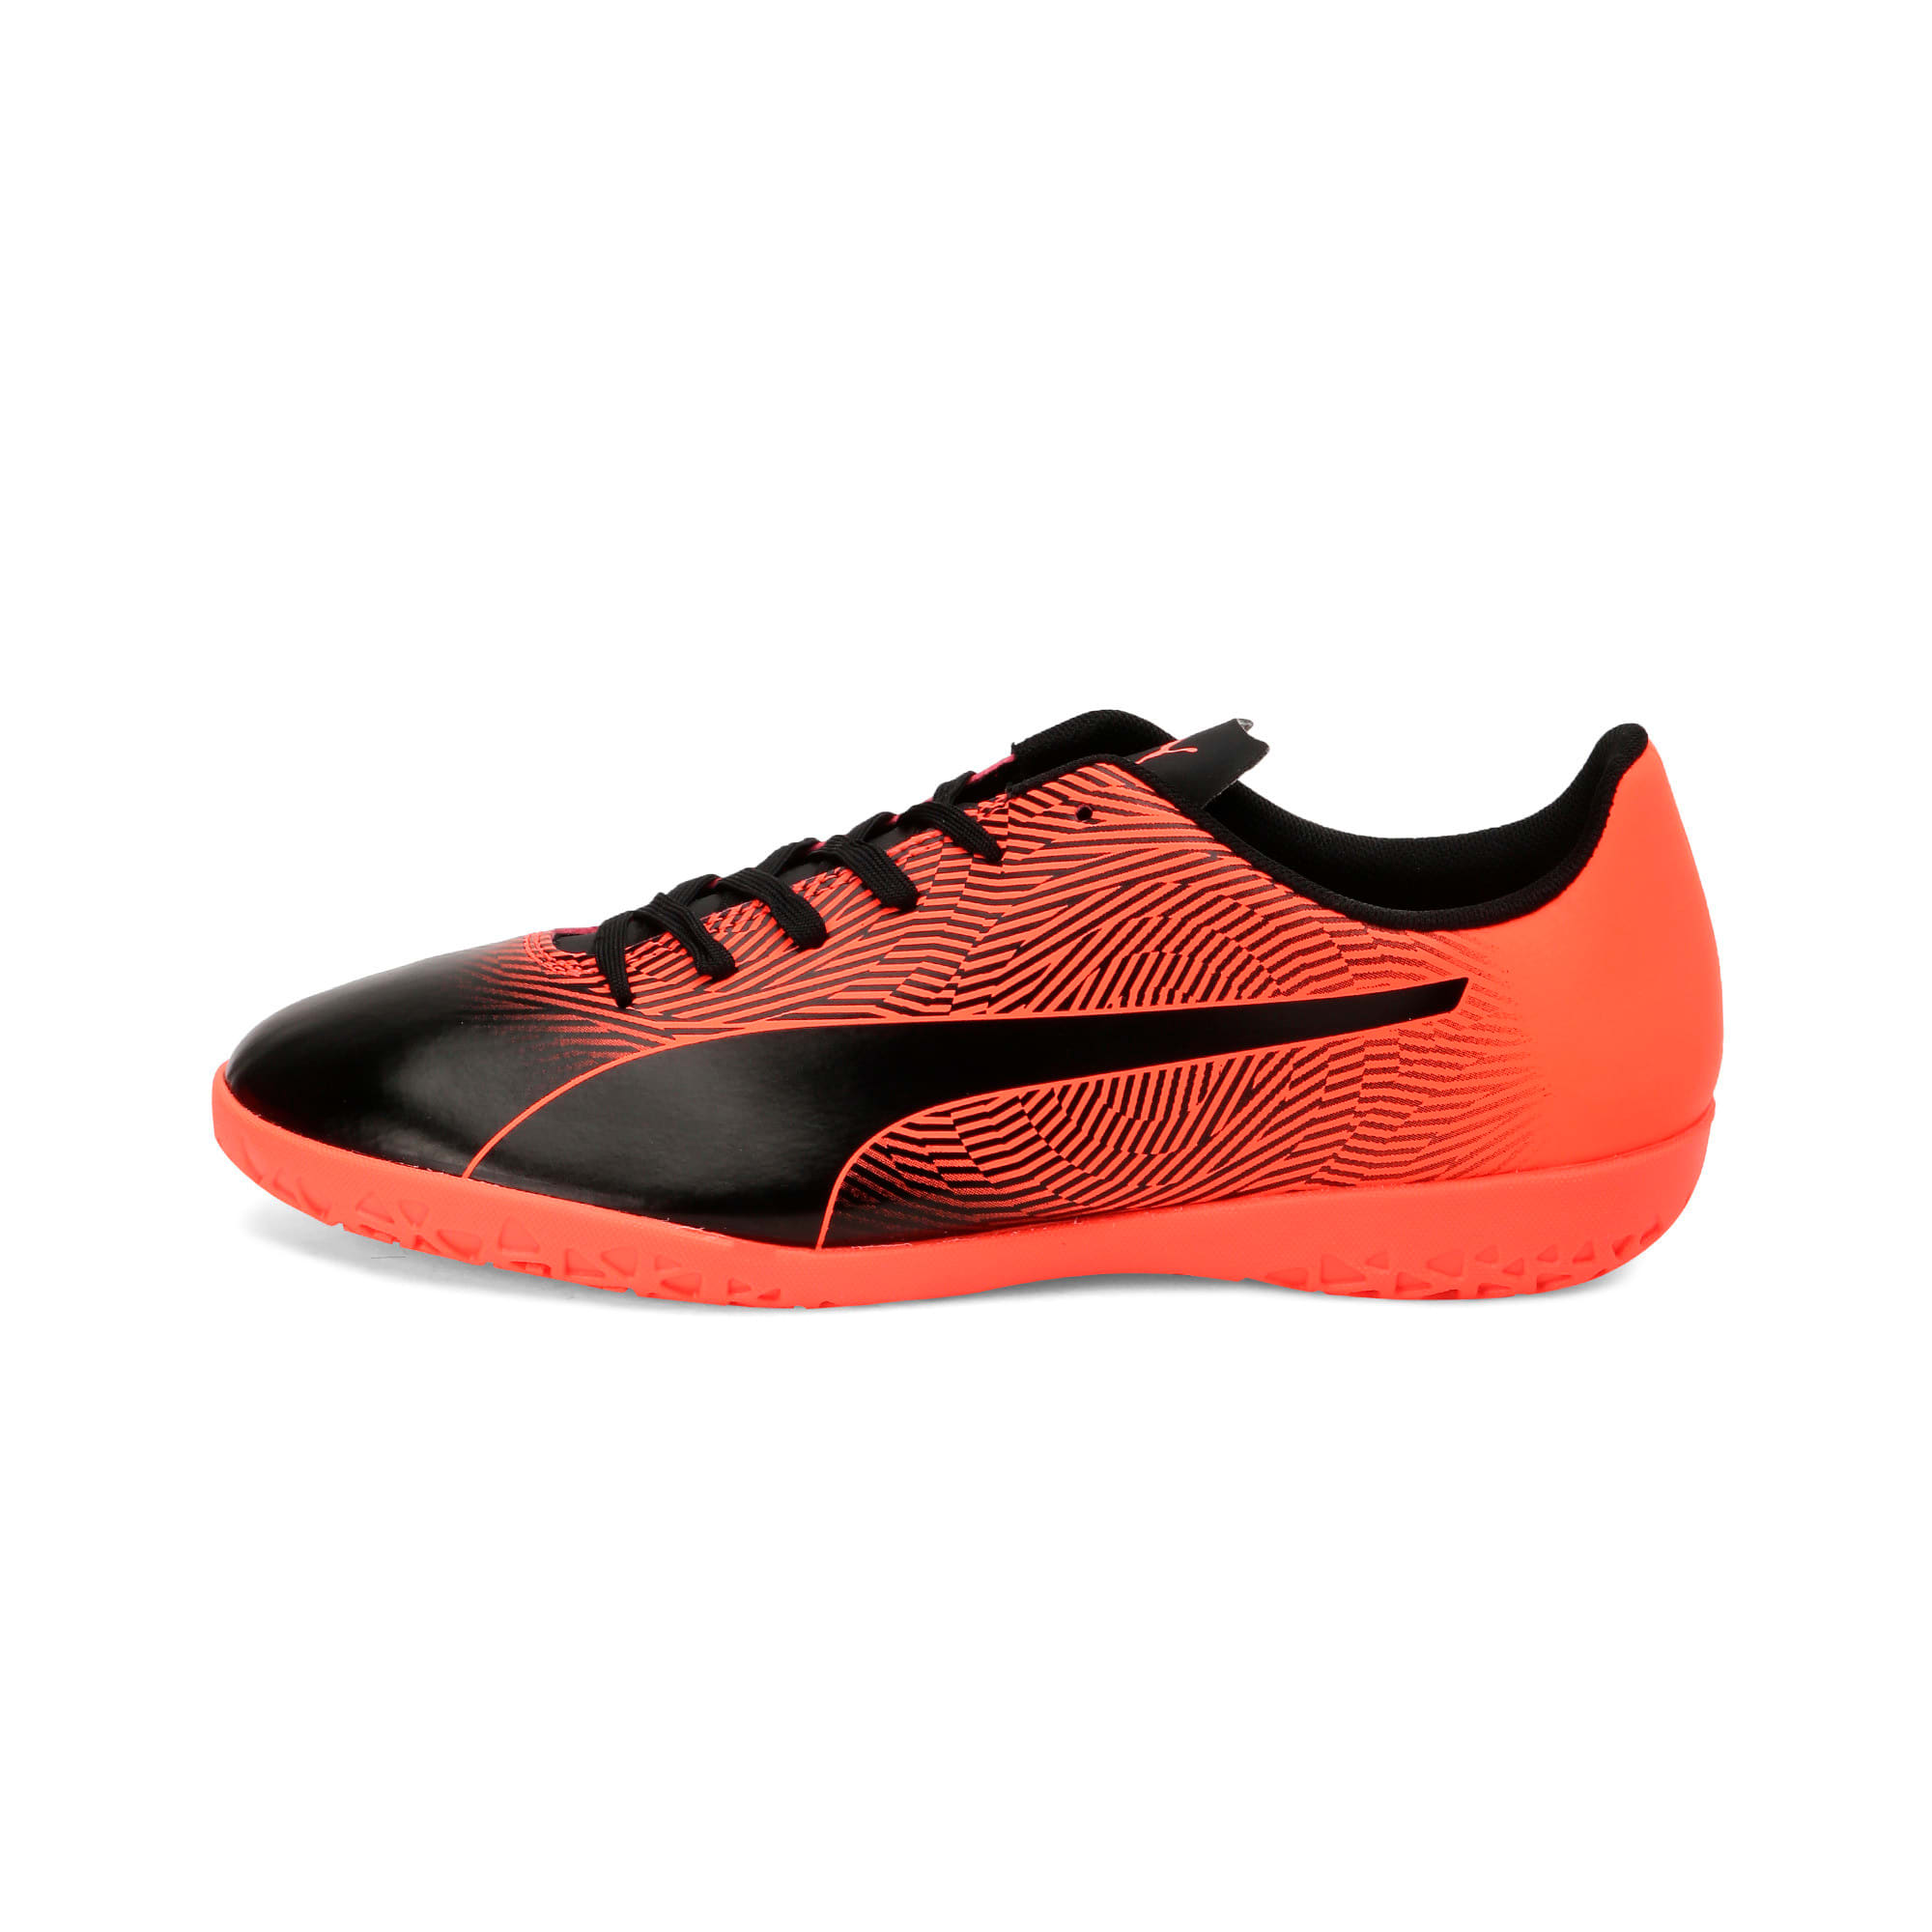 Thumbnail 1 of PUMA Spirit II IT Men's Football Boots, Puma Black-Nrgy Red, medium-IND